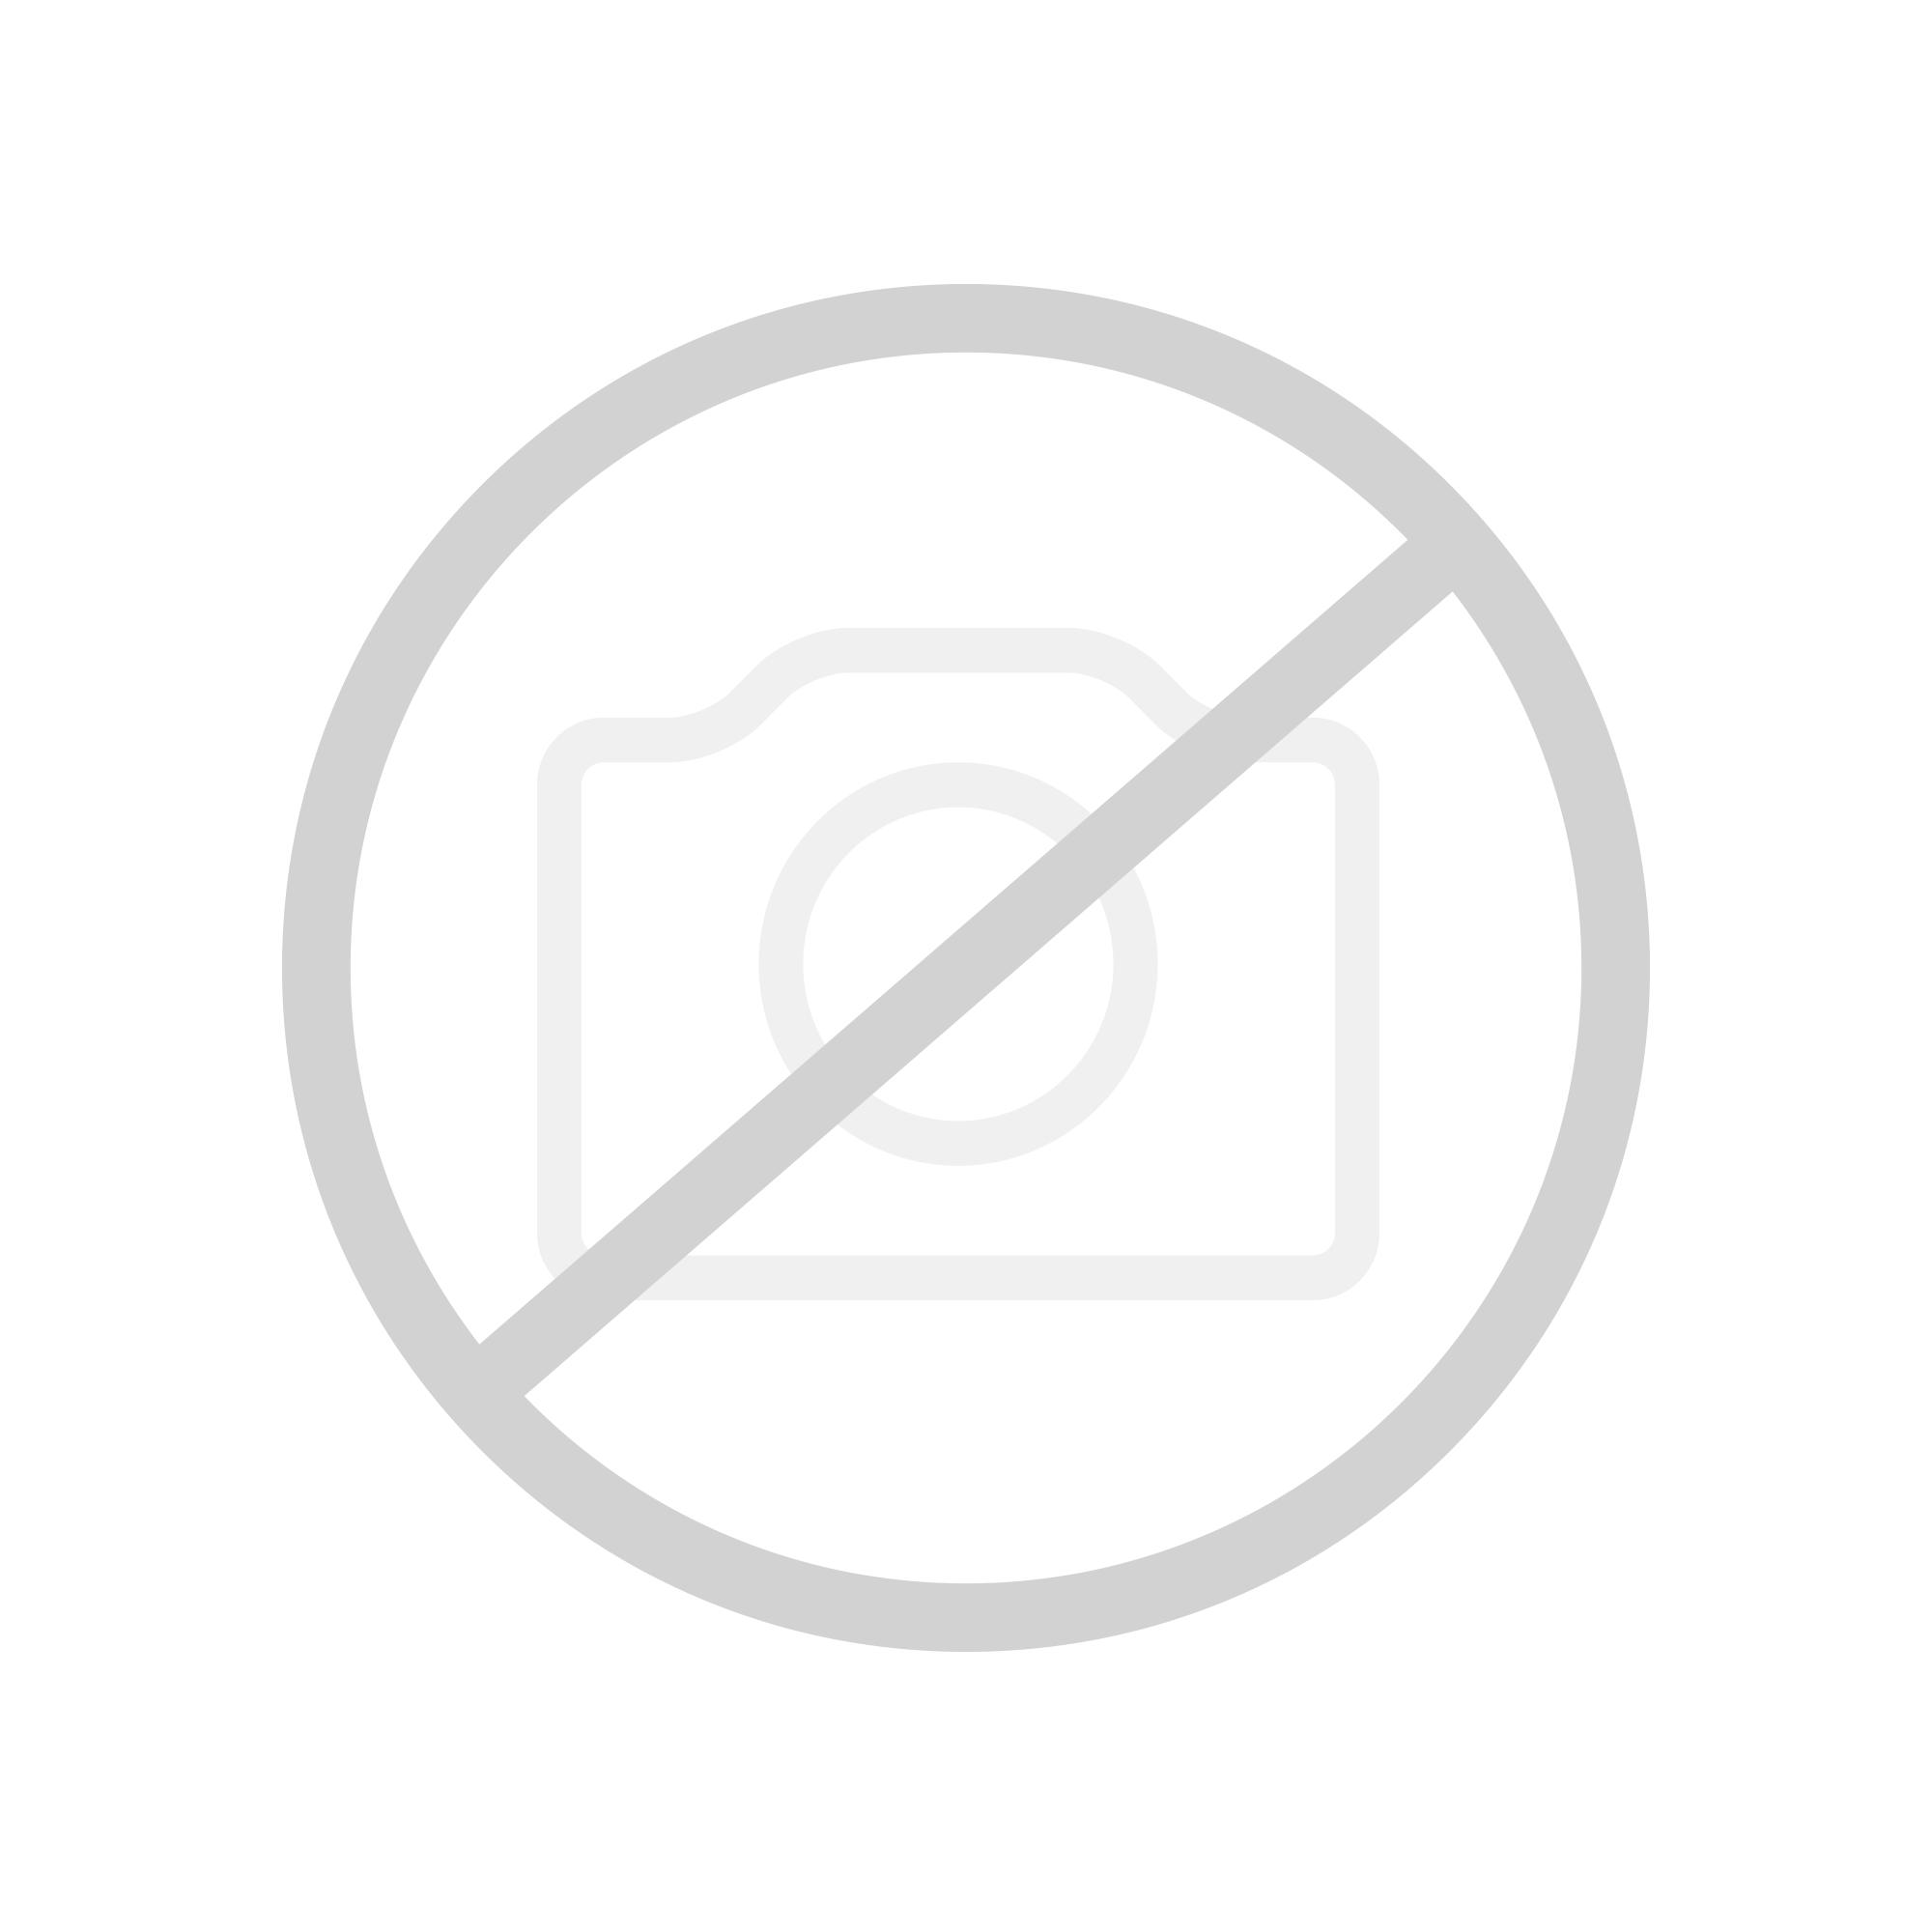 Tellk Badewanne tellk vintage freistehende badewanne l 180 b 85 h 63 cm 0100